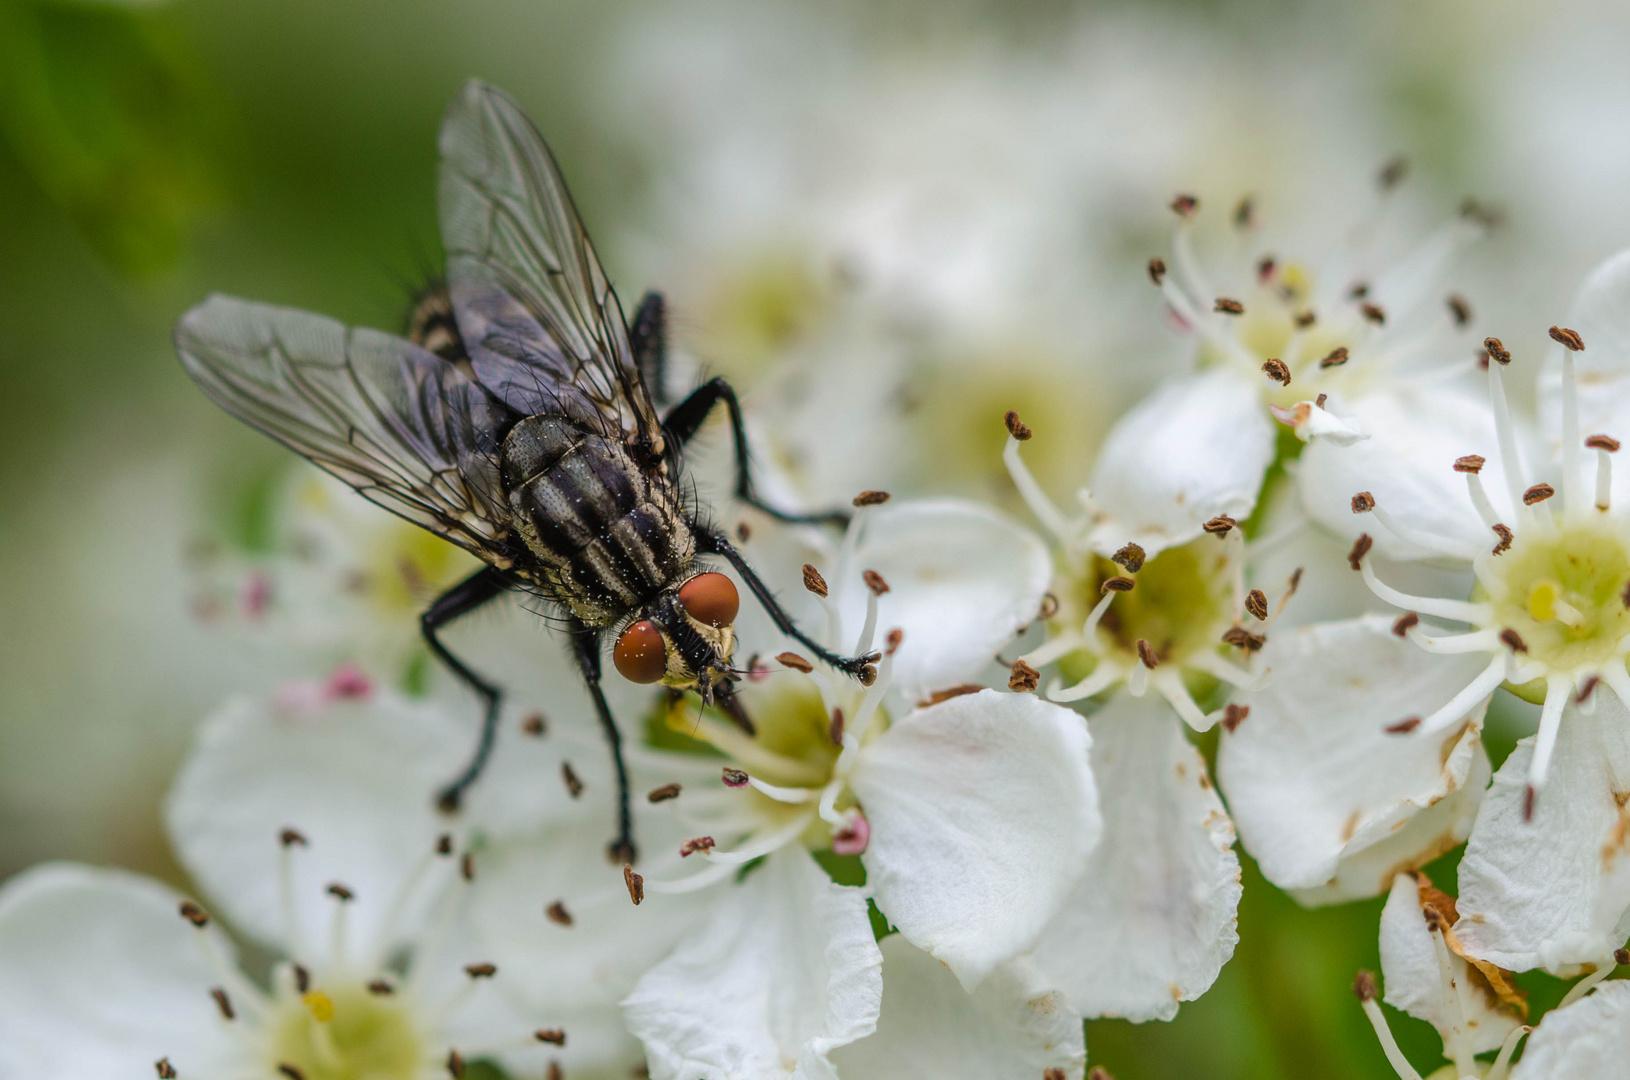 Fliege mit großem Hunger